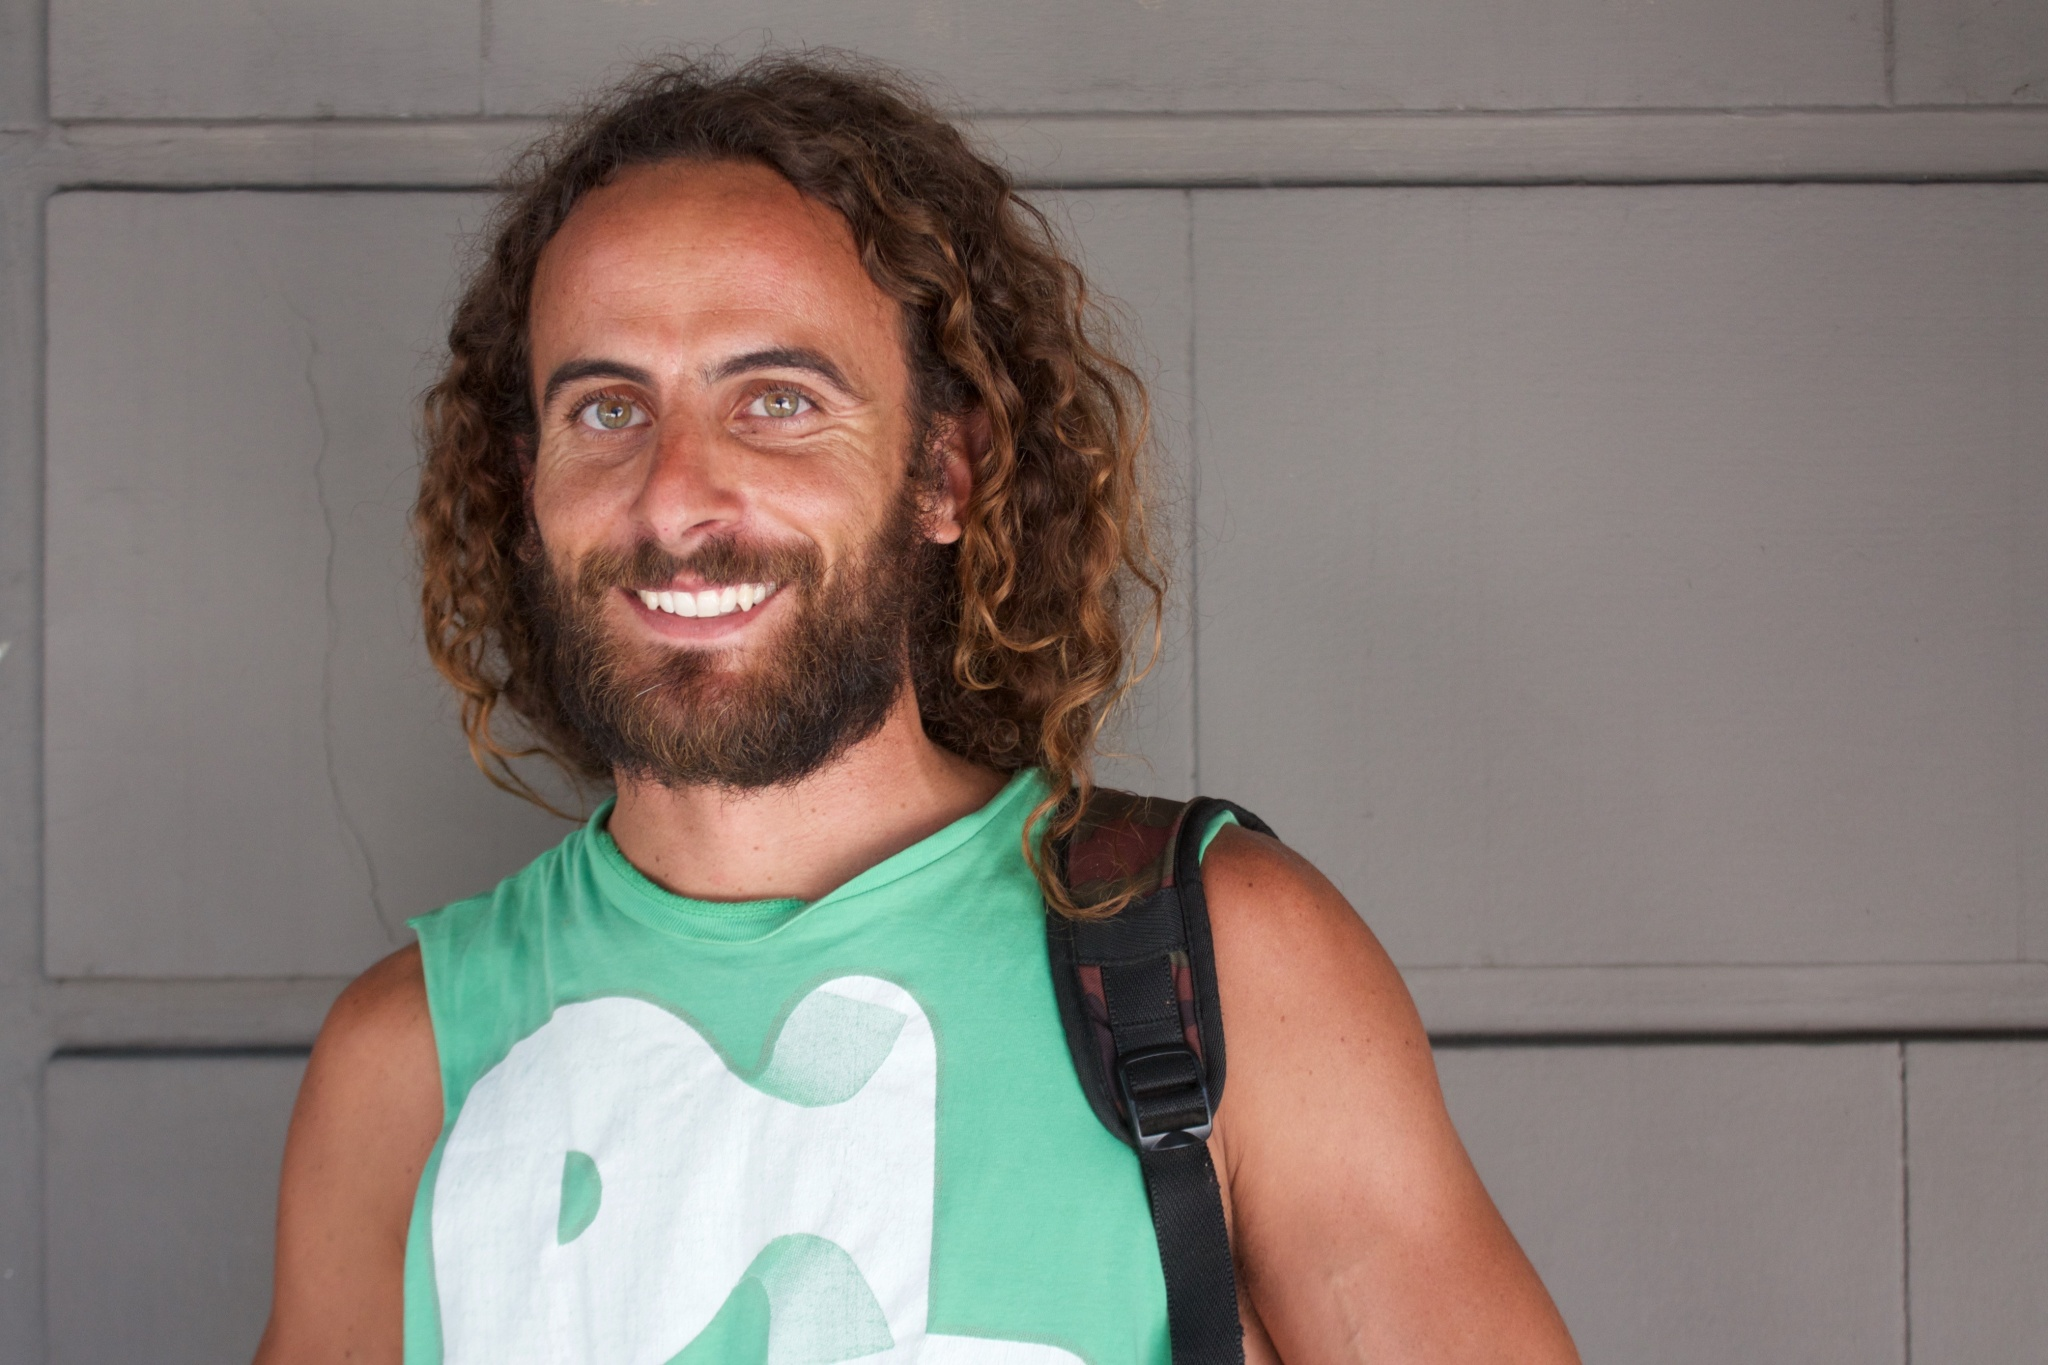 Nicolas Migueiz Montan à Buenos Aires. Crédits : Justine Perez / Opinion Internationale.